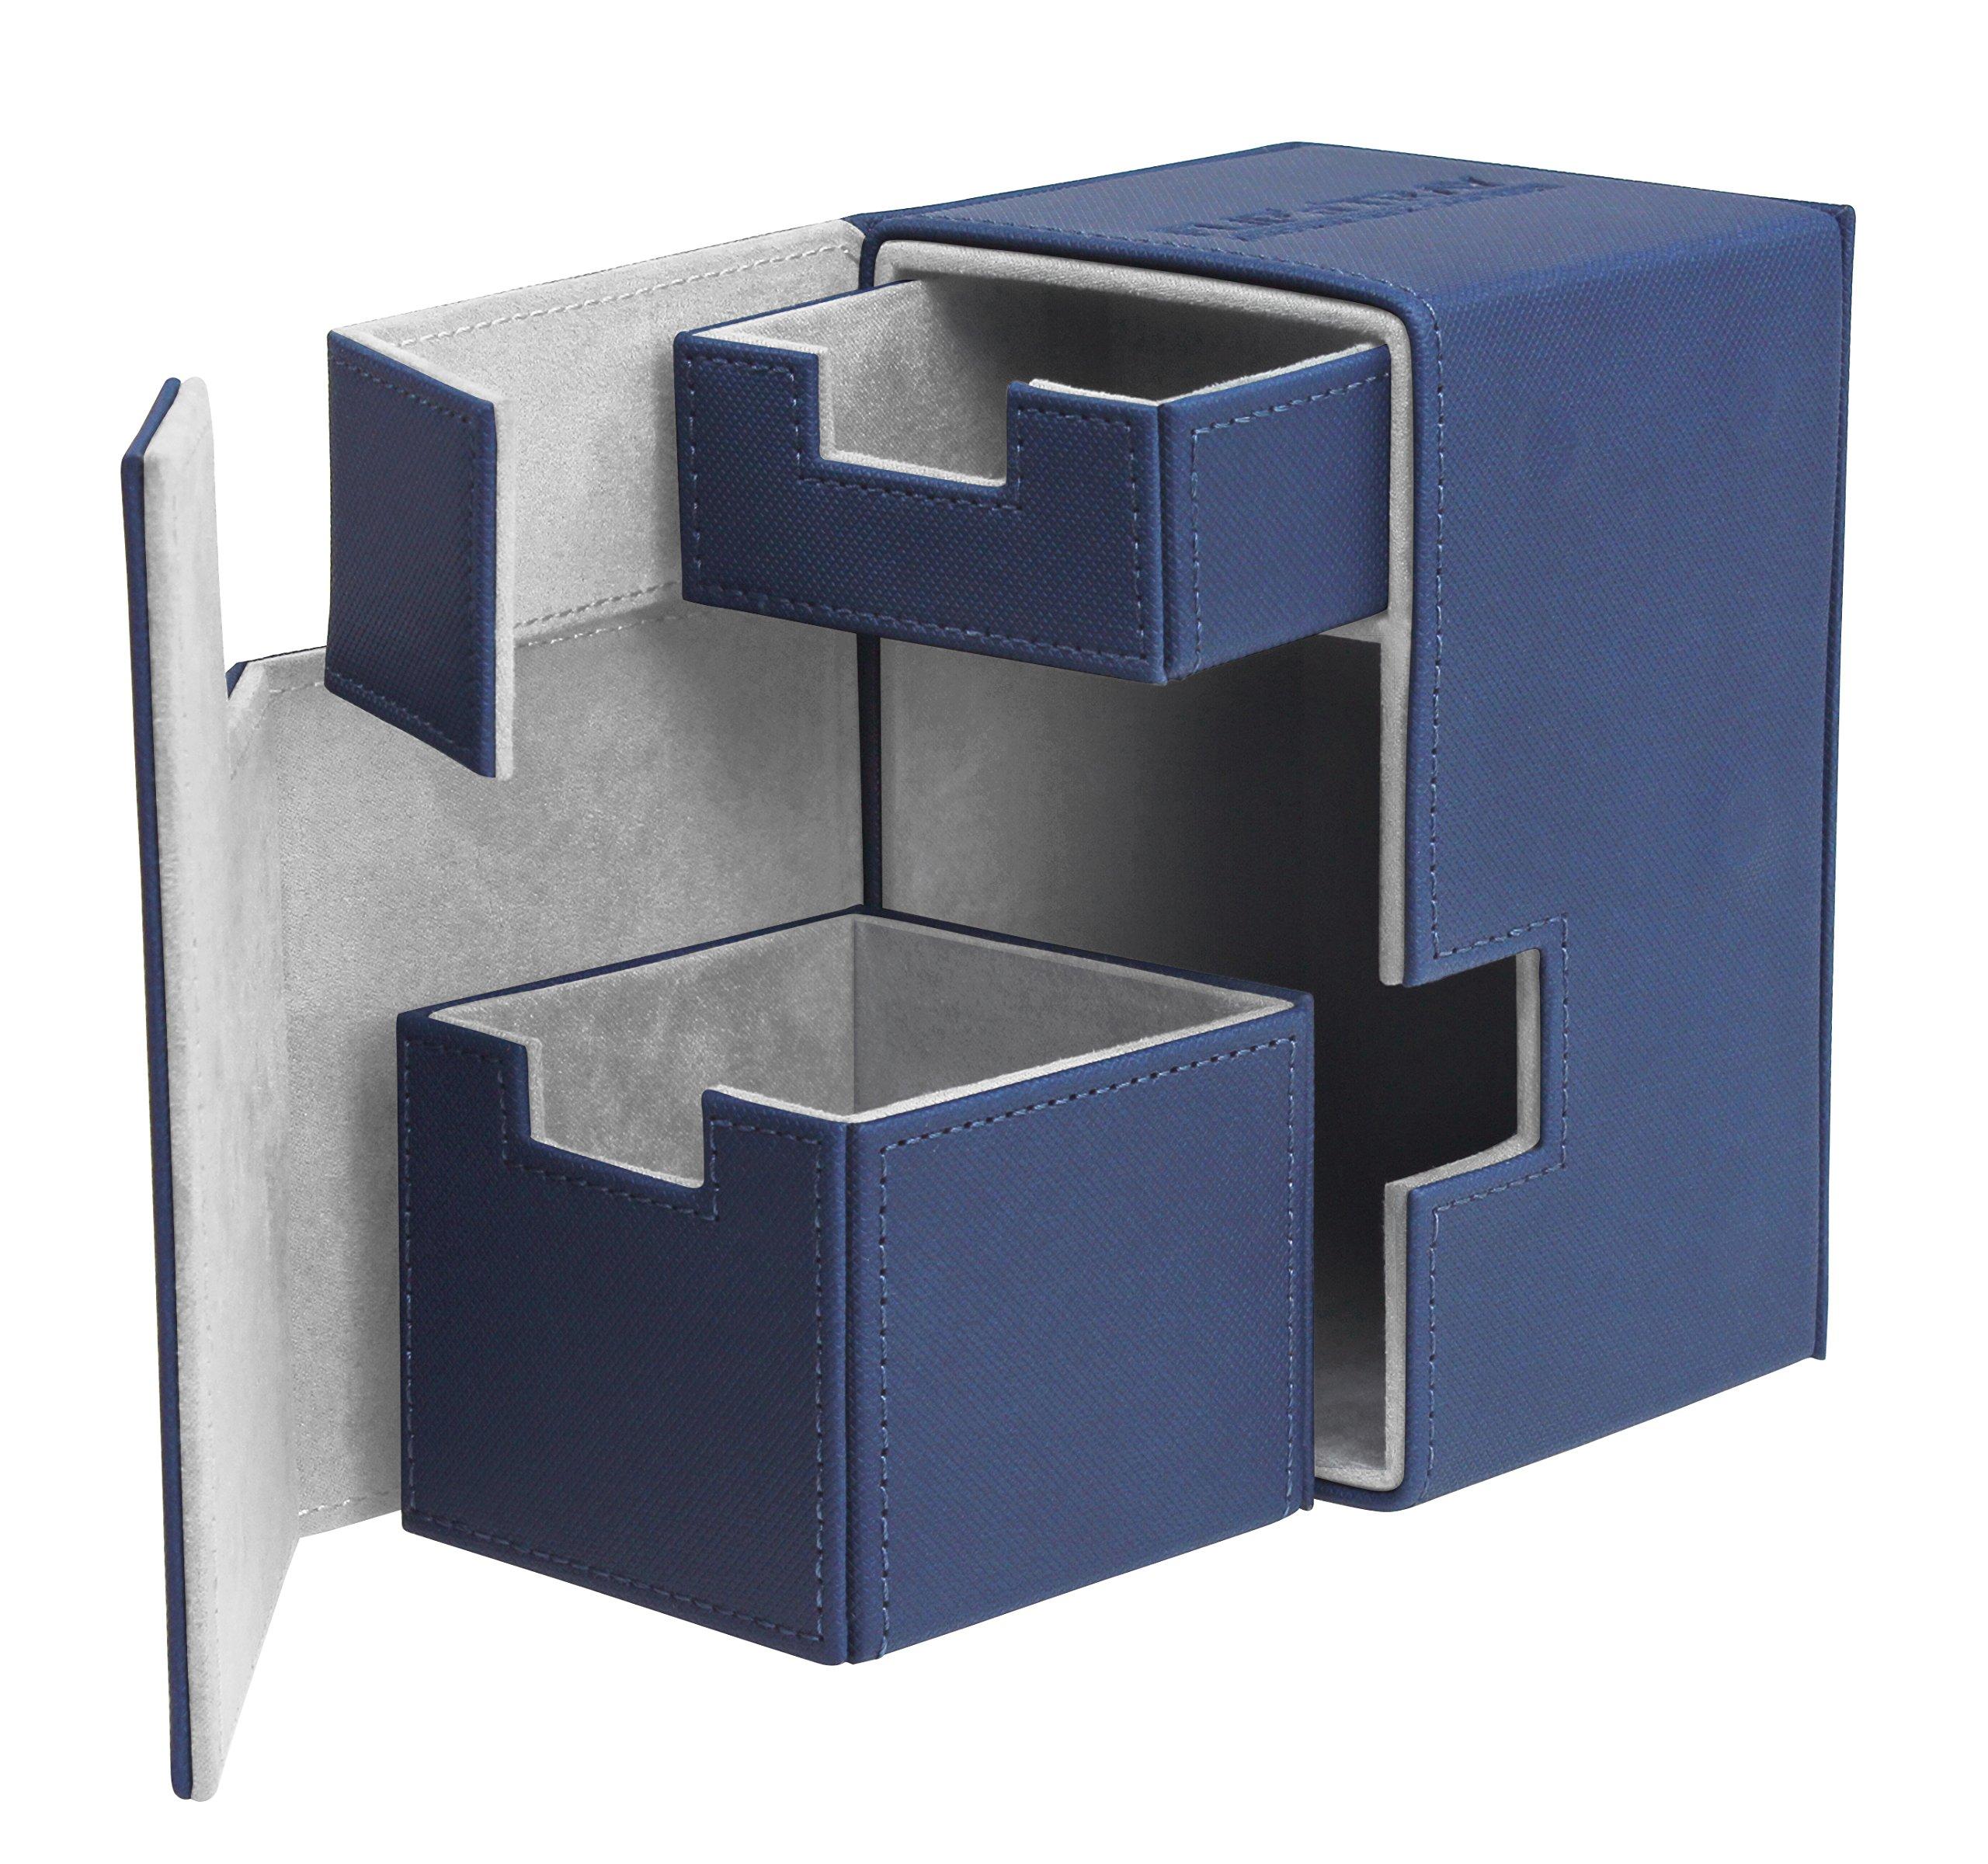 Flip N Tray Xenoskin Deck Case 100/120 Card, Blue by Ultimate Guard